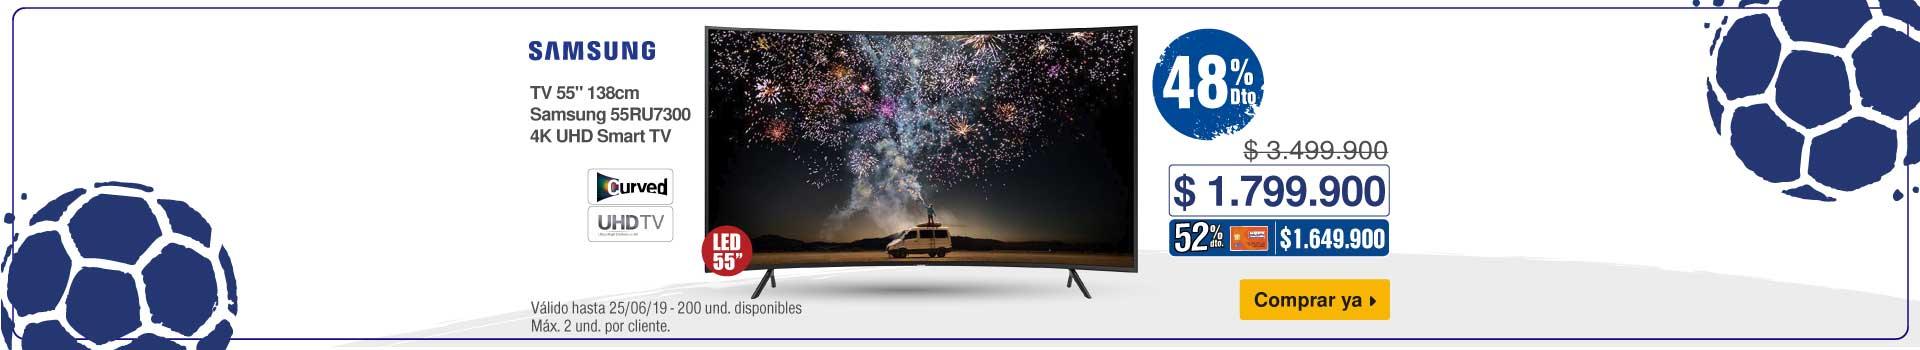 AK-TV-SAMSUNG-55RU7300-HiperOfertas_TV_Video4-22JUN